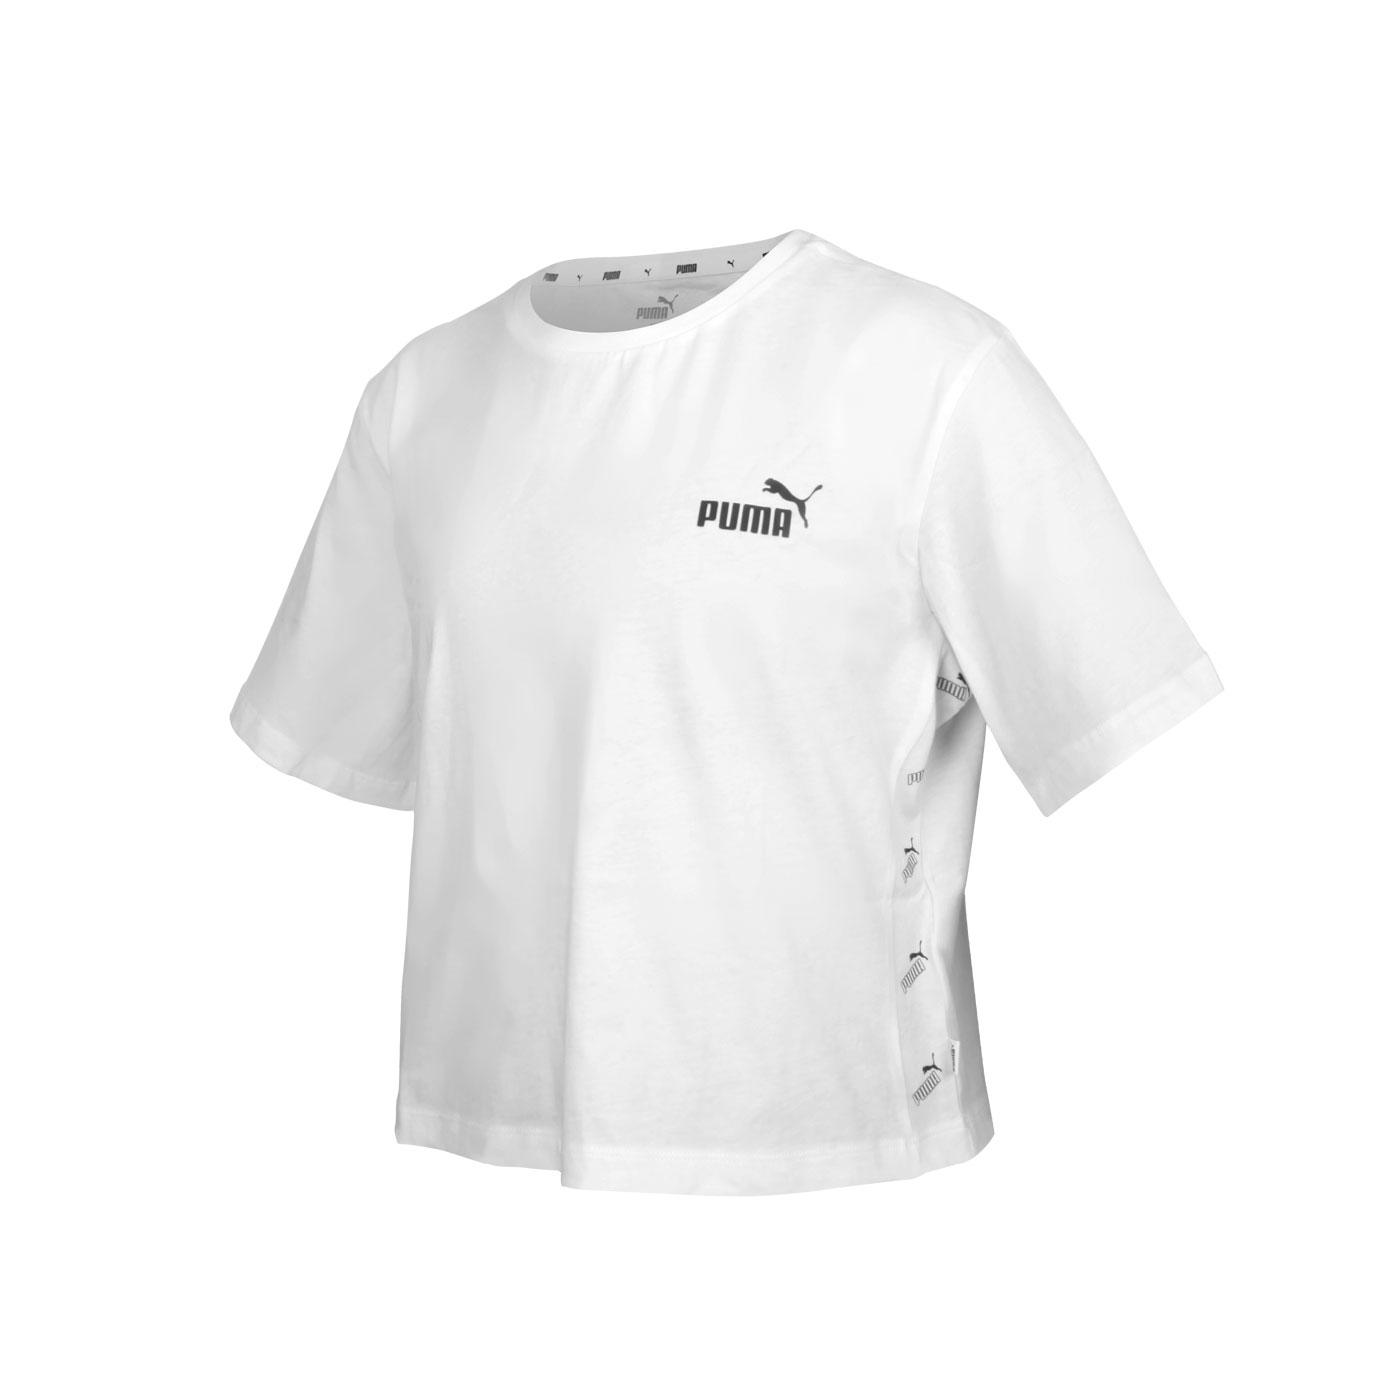 PUMA 女款基本系列短版短袖T恤 58659701 - 白黑